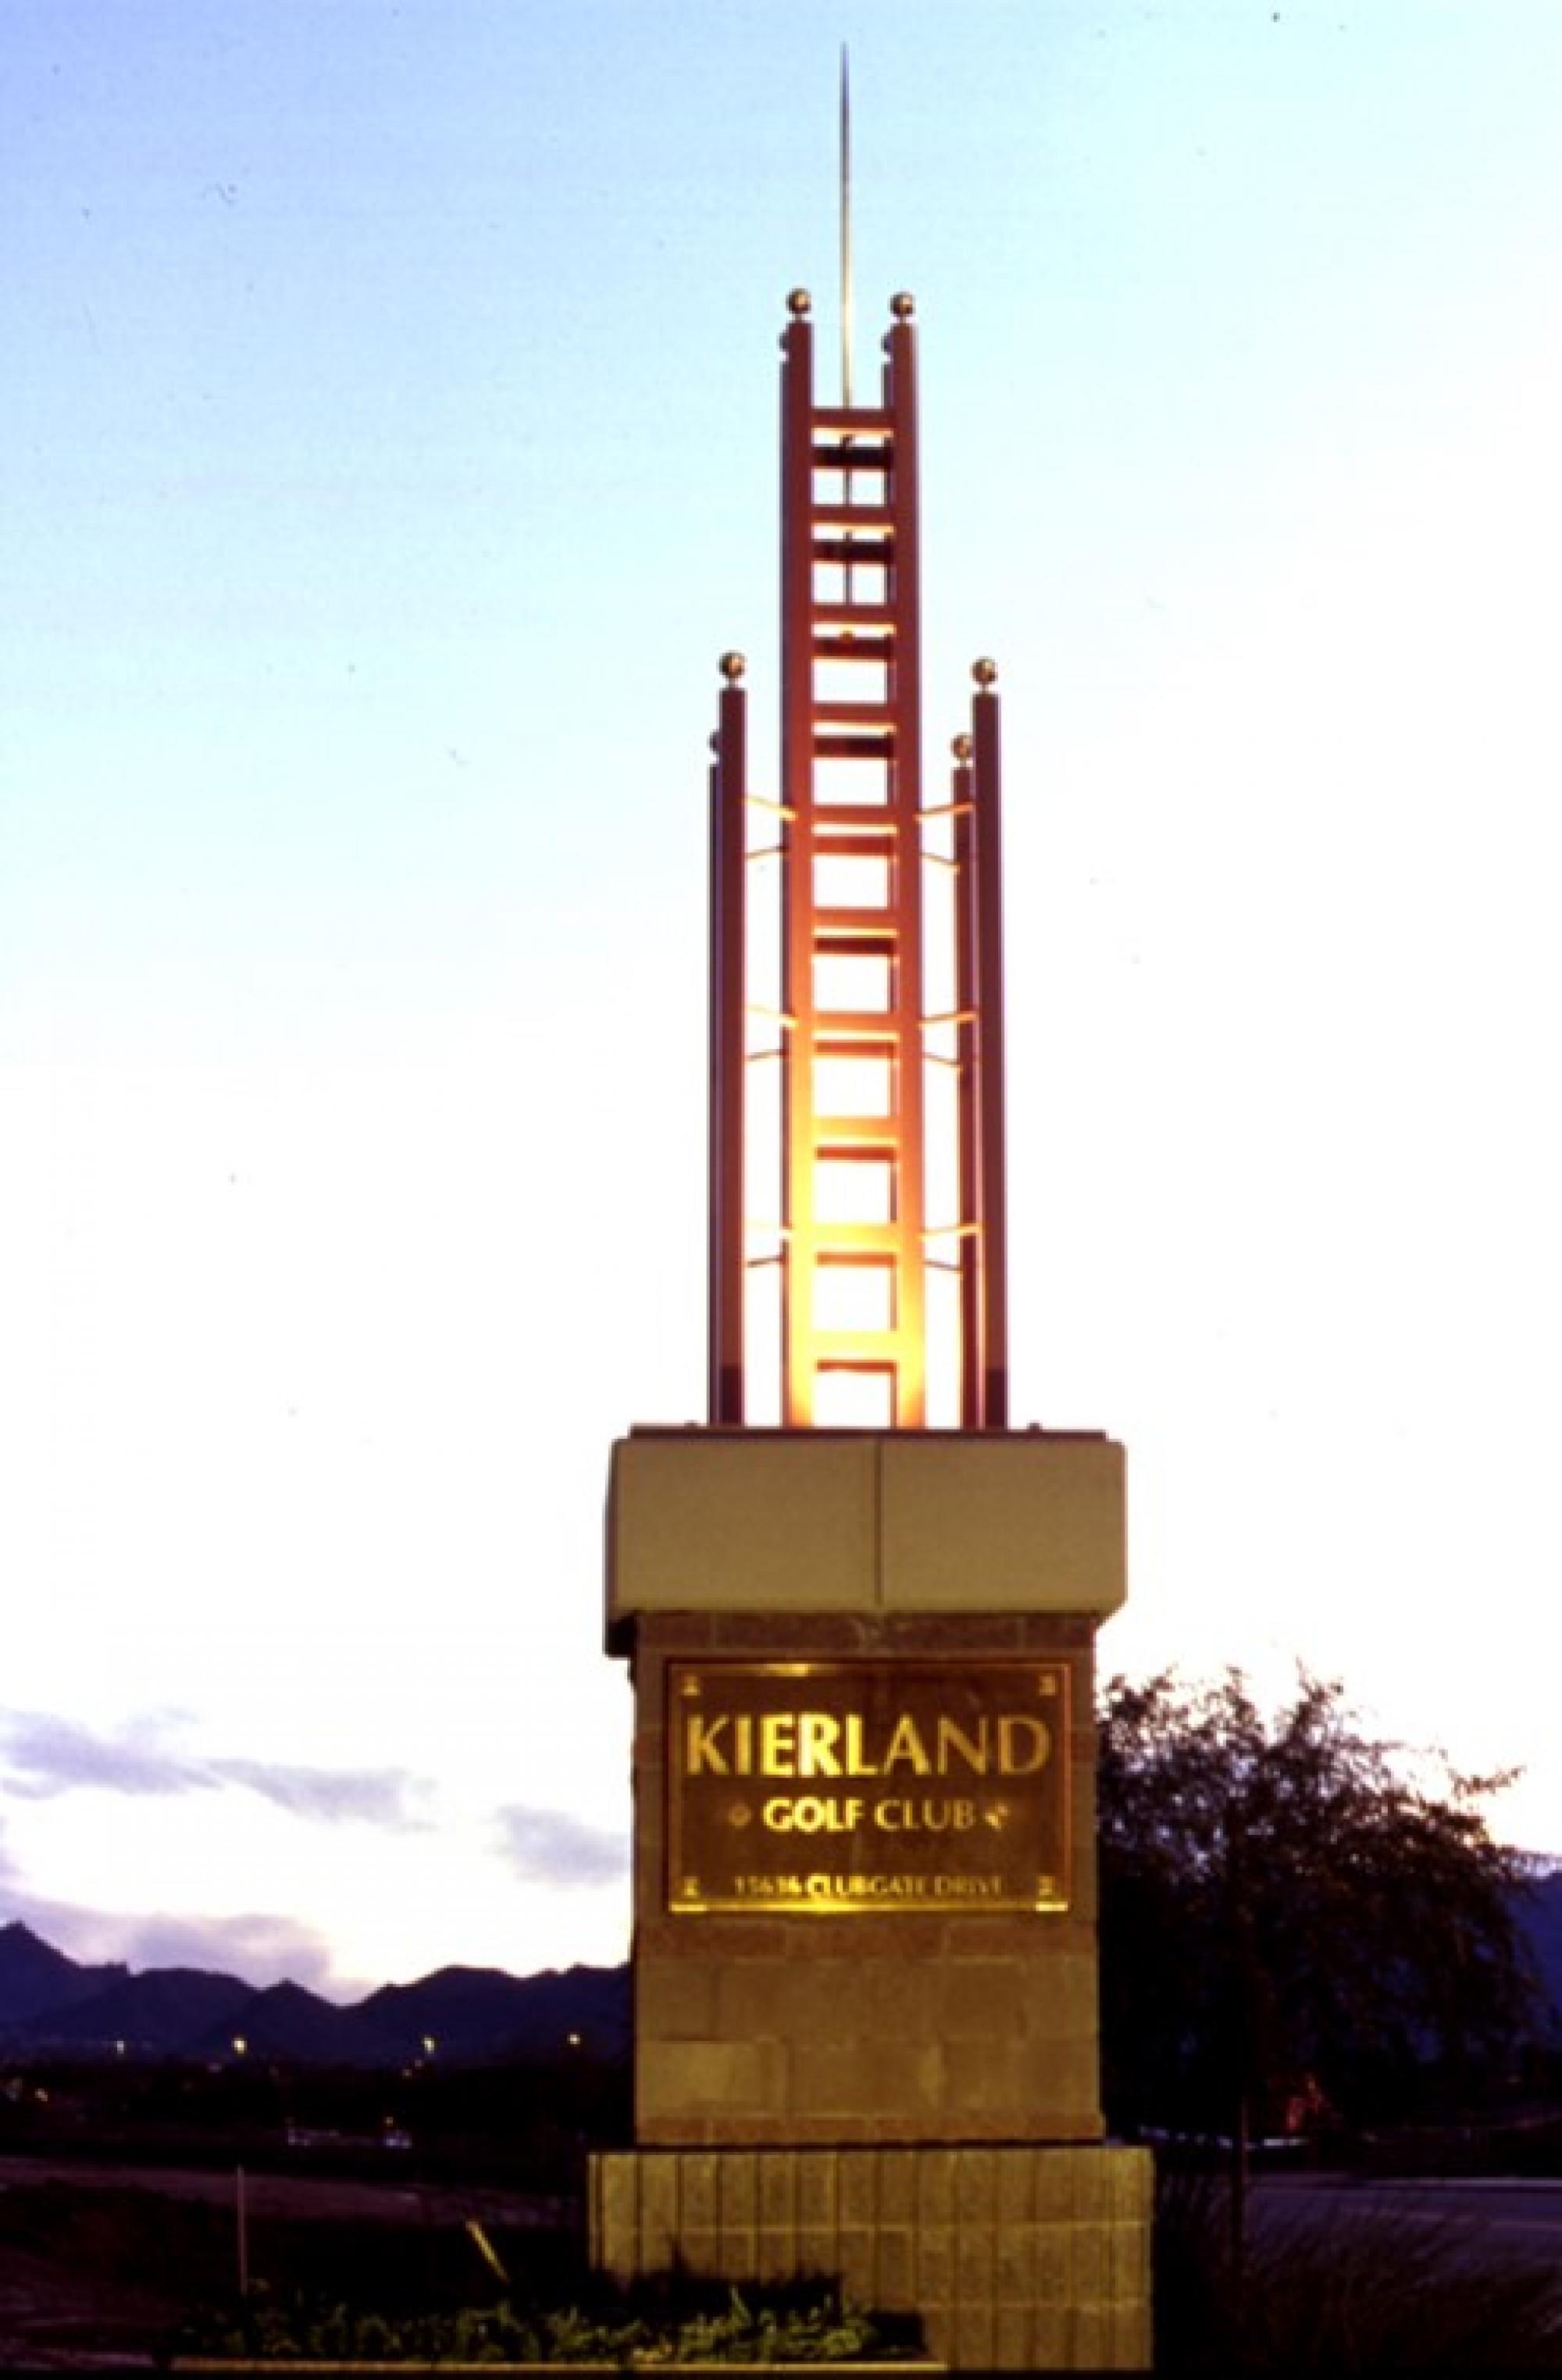 Kierland Golf Club Entry Monument